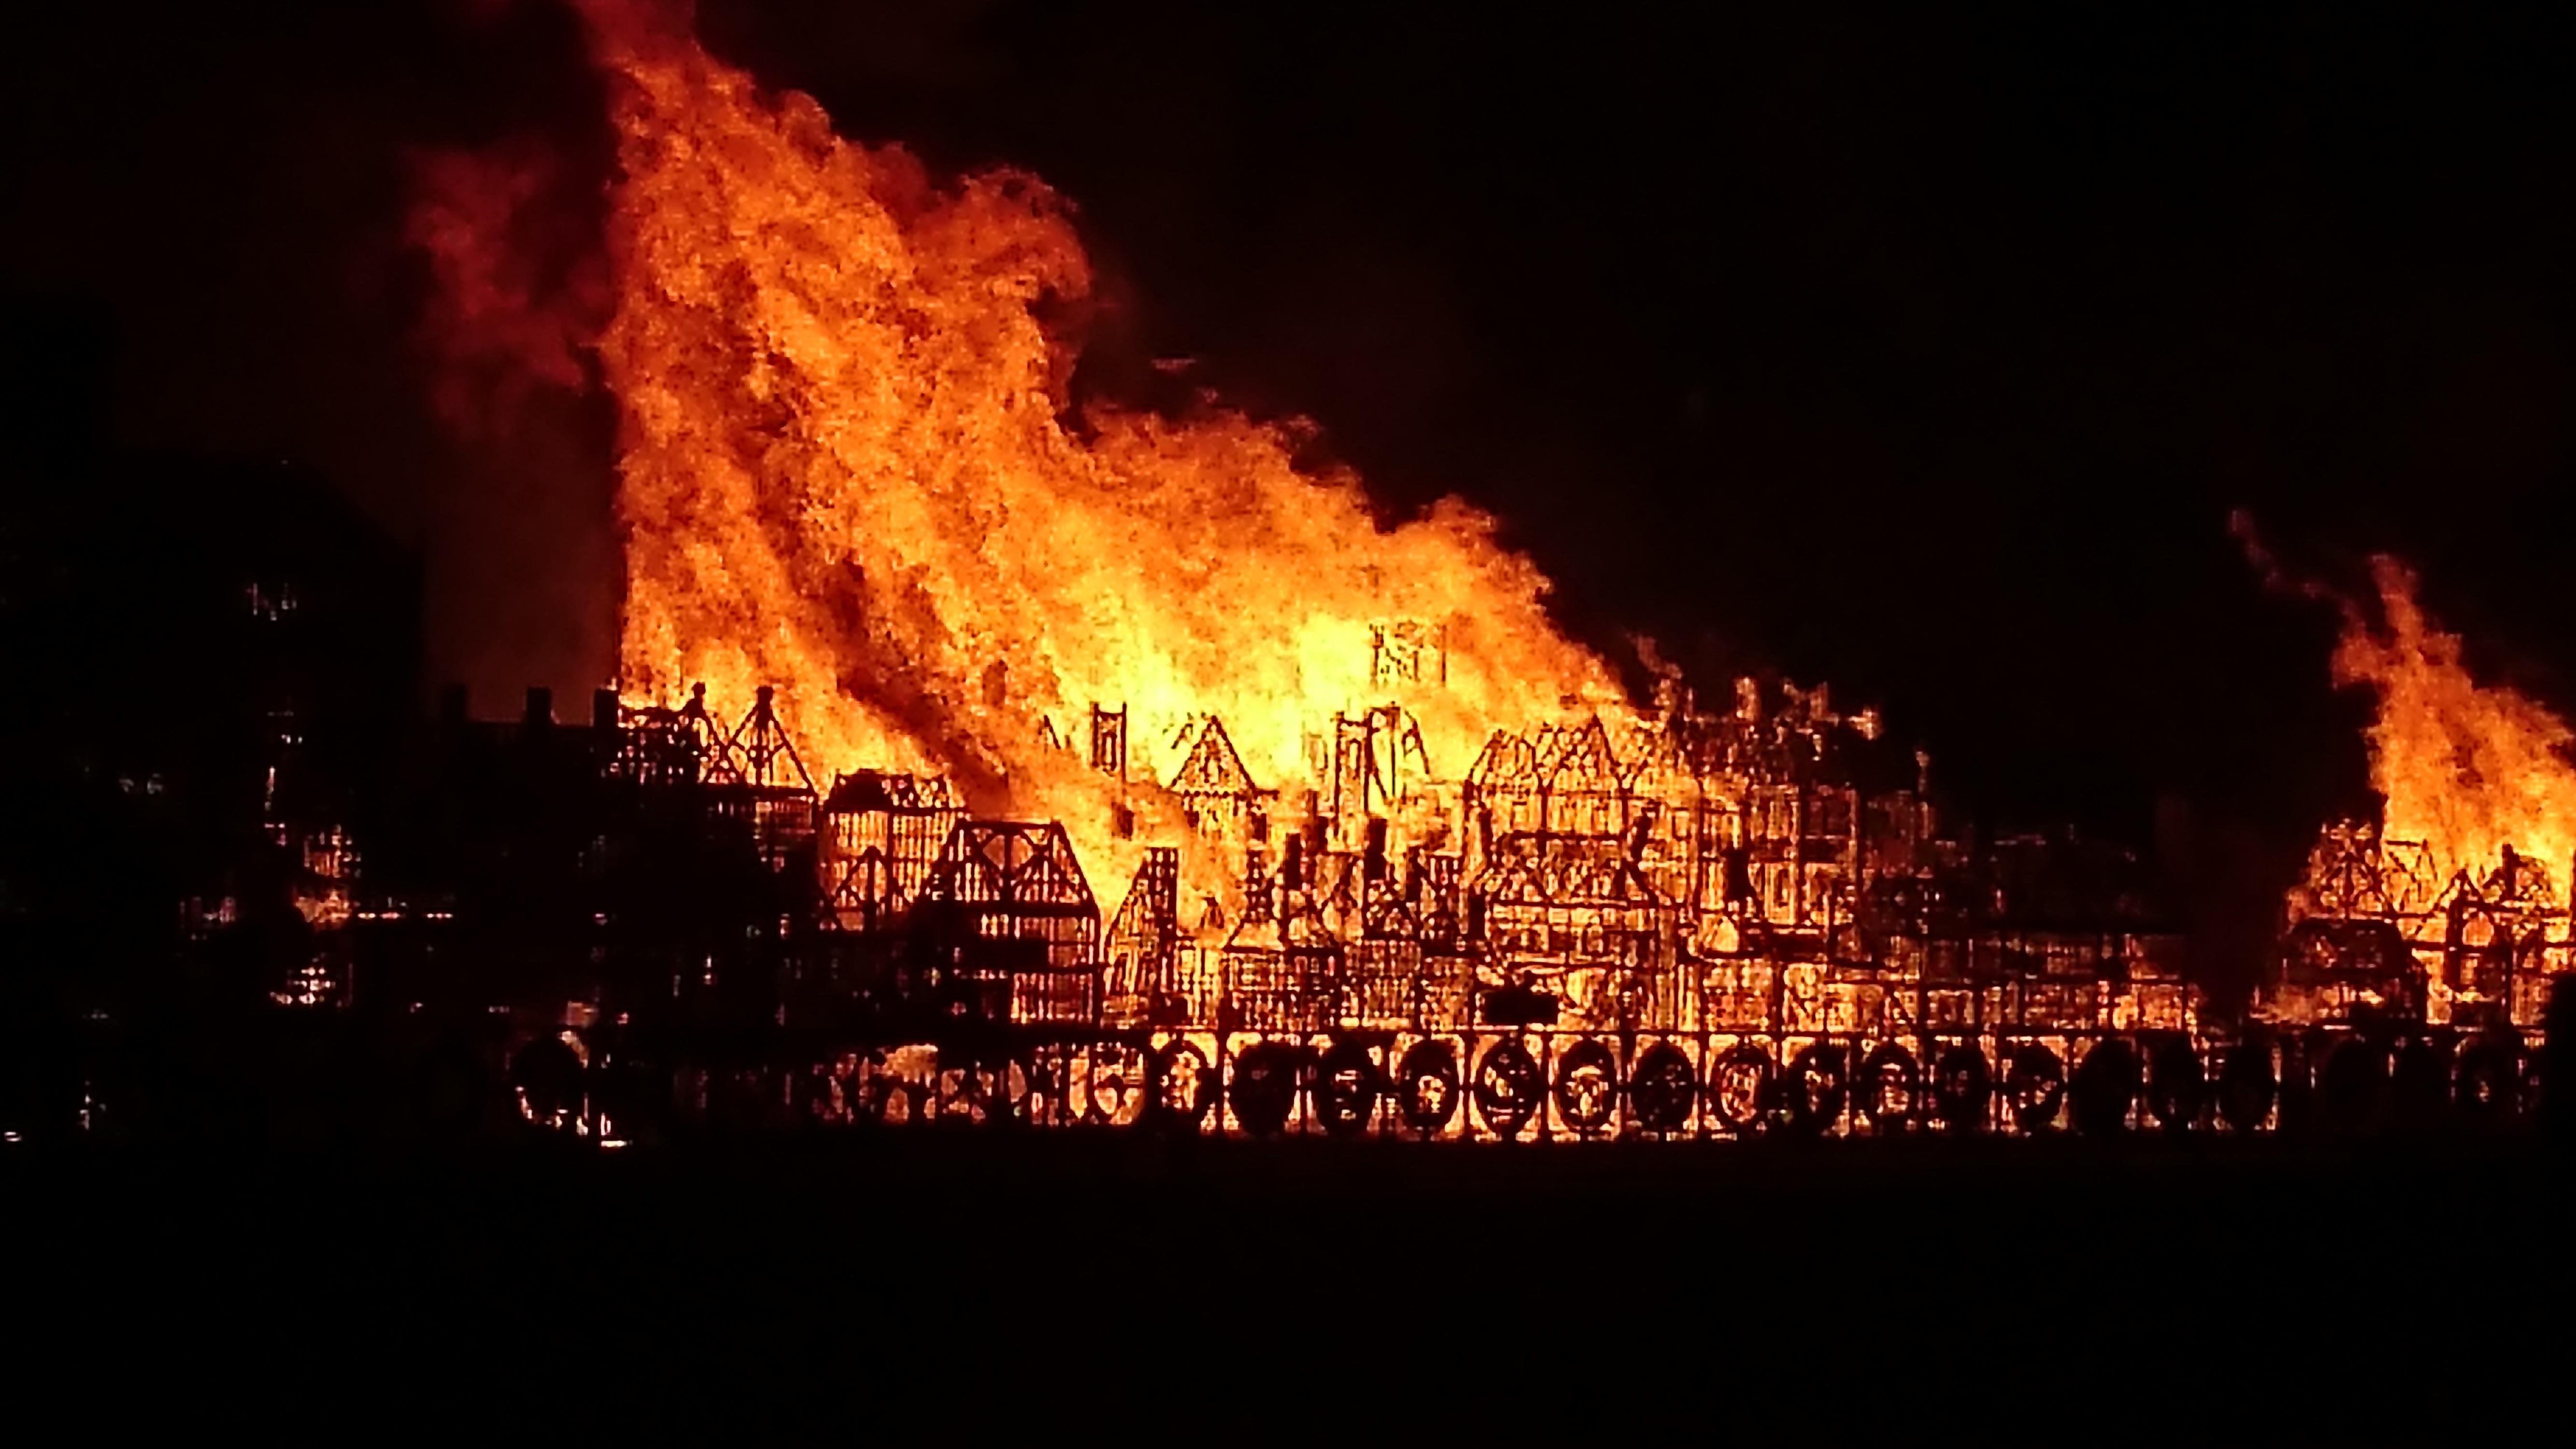 A photograph of a fire